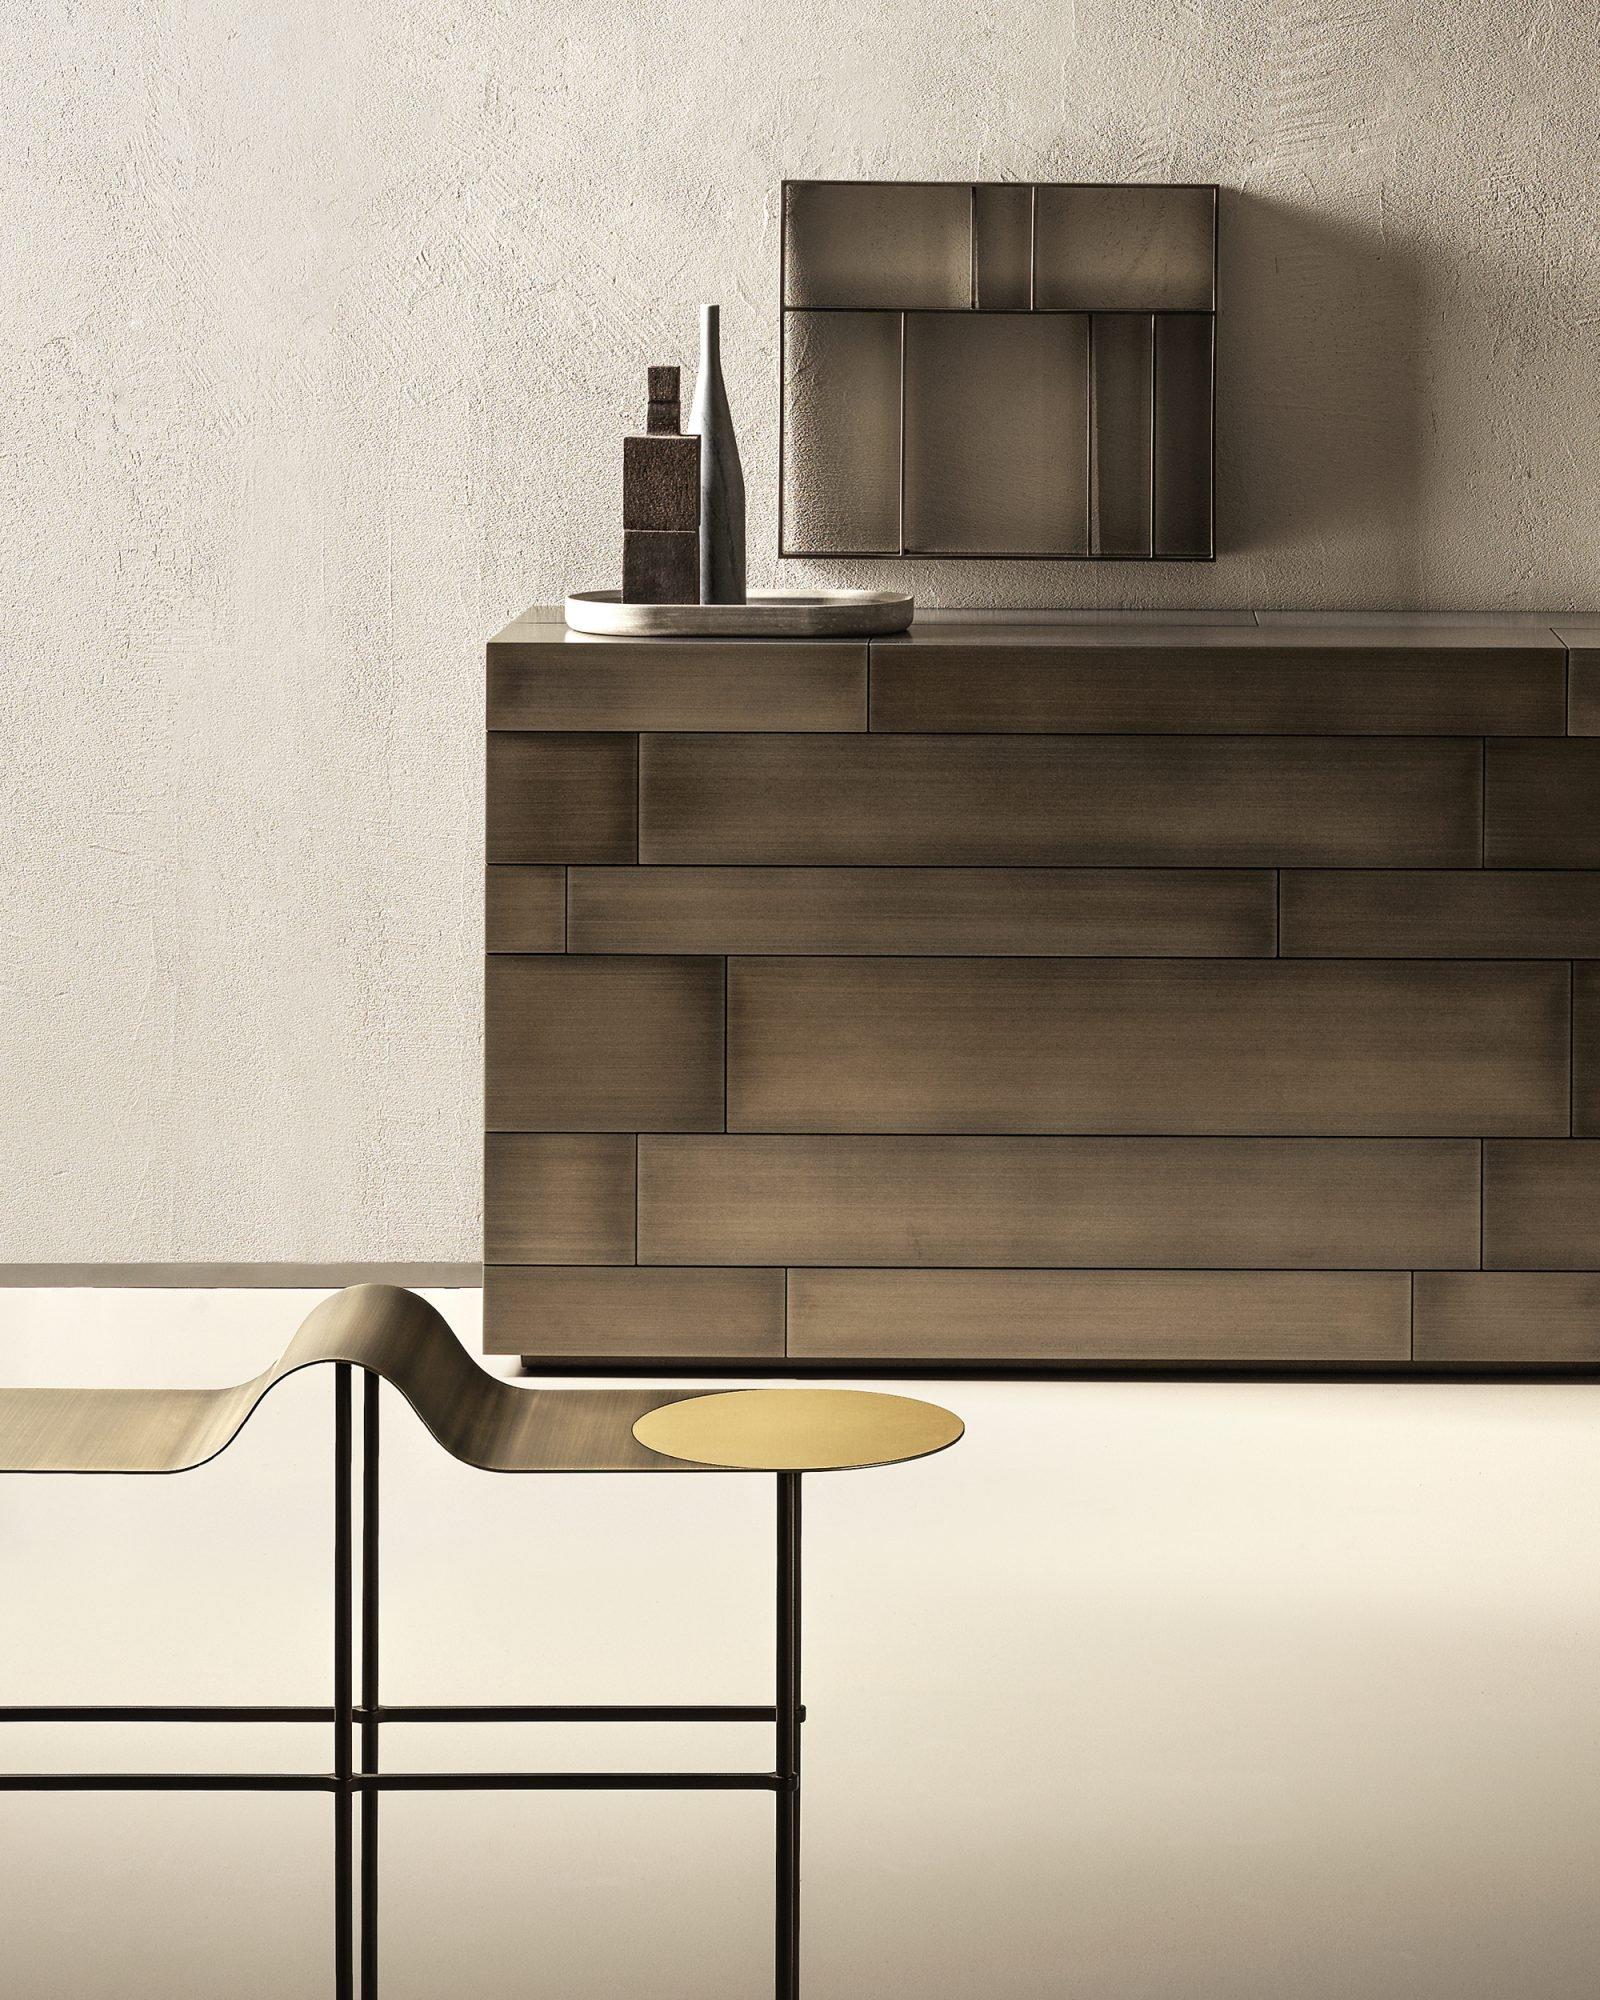 Scribble Table console from De Castelli, designed by Francesca Lanzavecchia